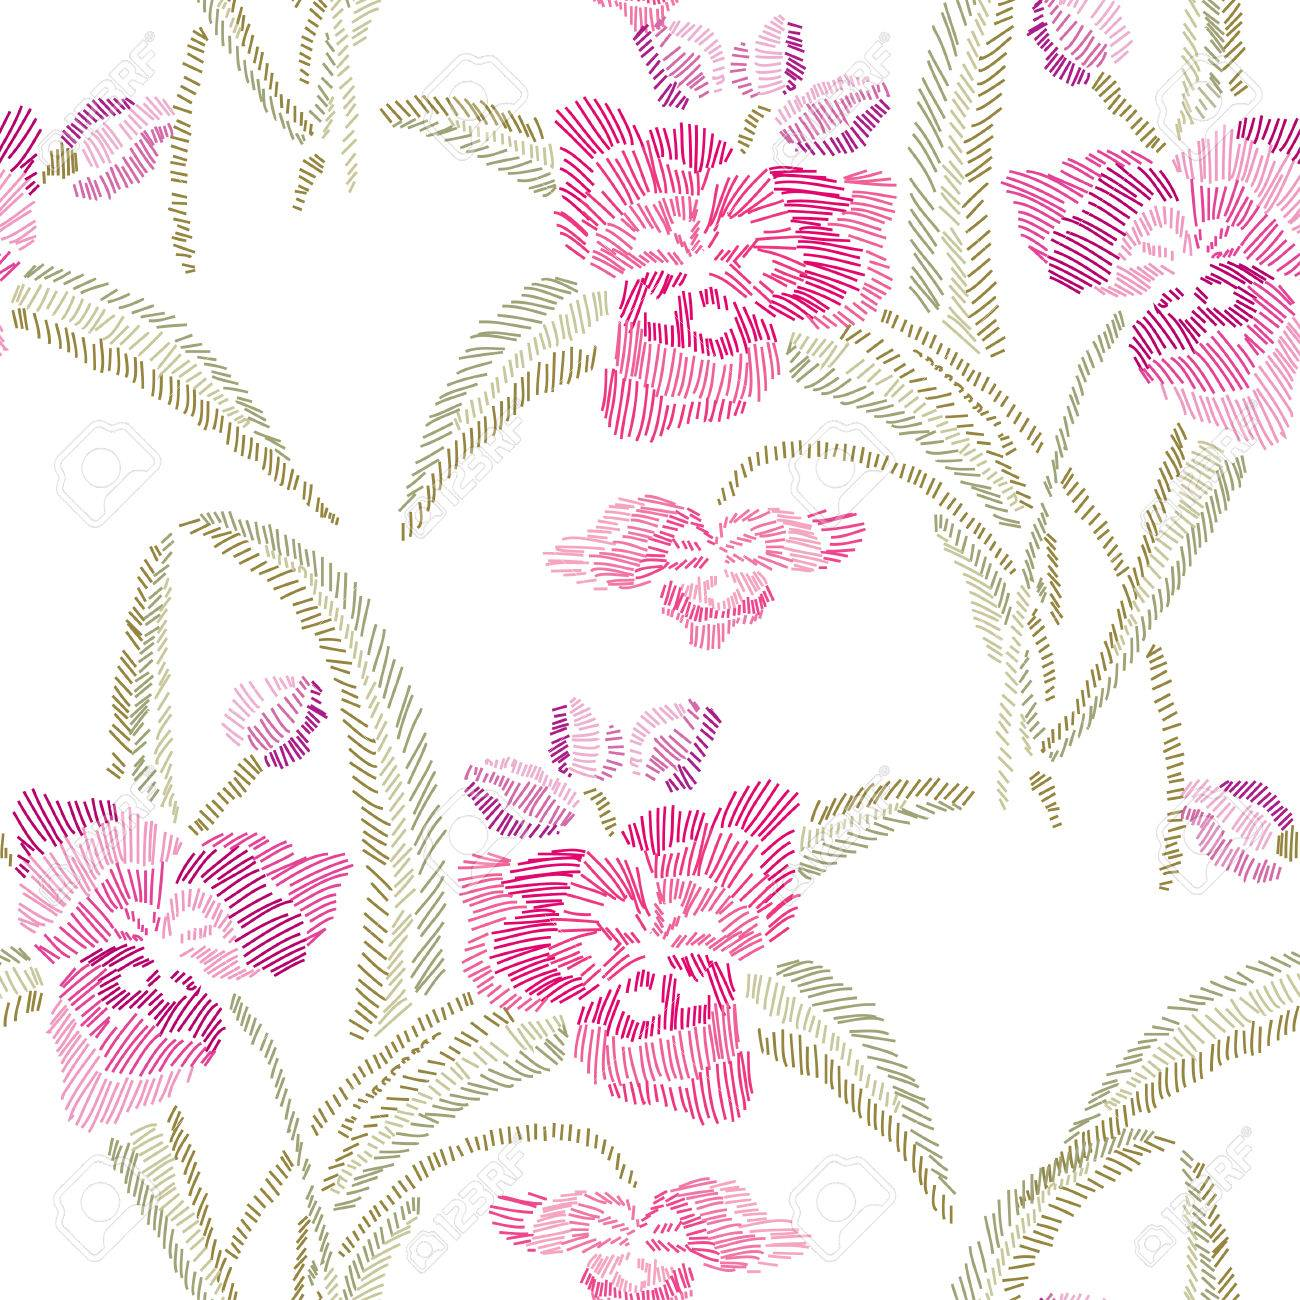 Elegante Diseño Inconsútil Con Flores De Lirio Decorativas Dibujadas ...